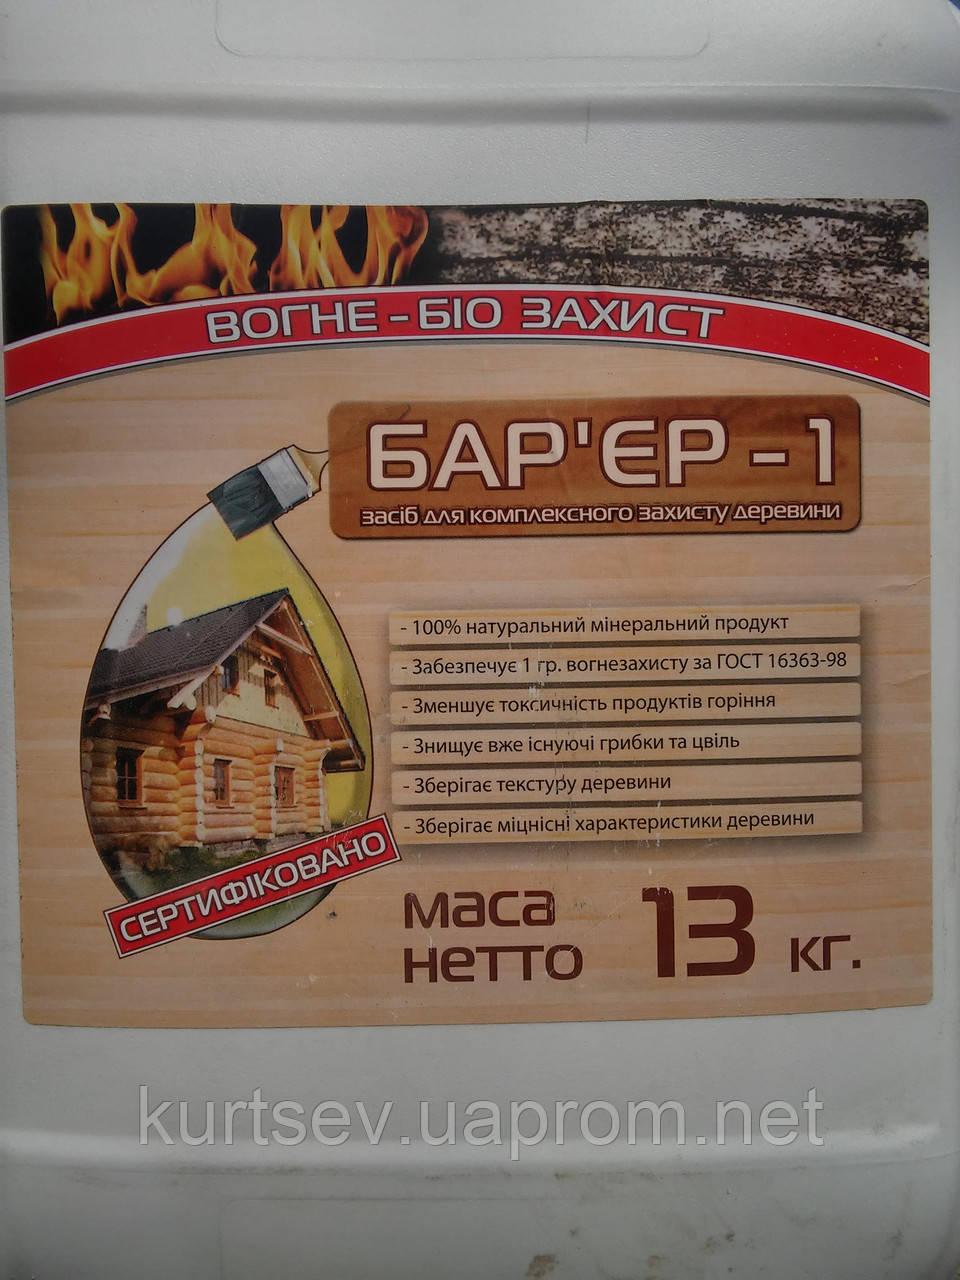 Антисептик Барьер-1 - ЛесТОРГ - пиломатериалы и изделия из дерева в Днепре